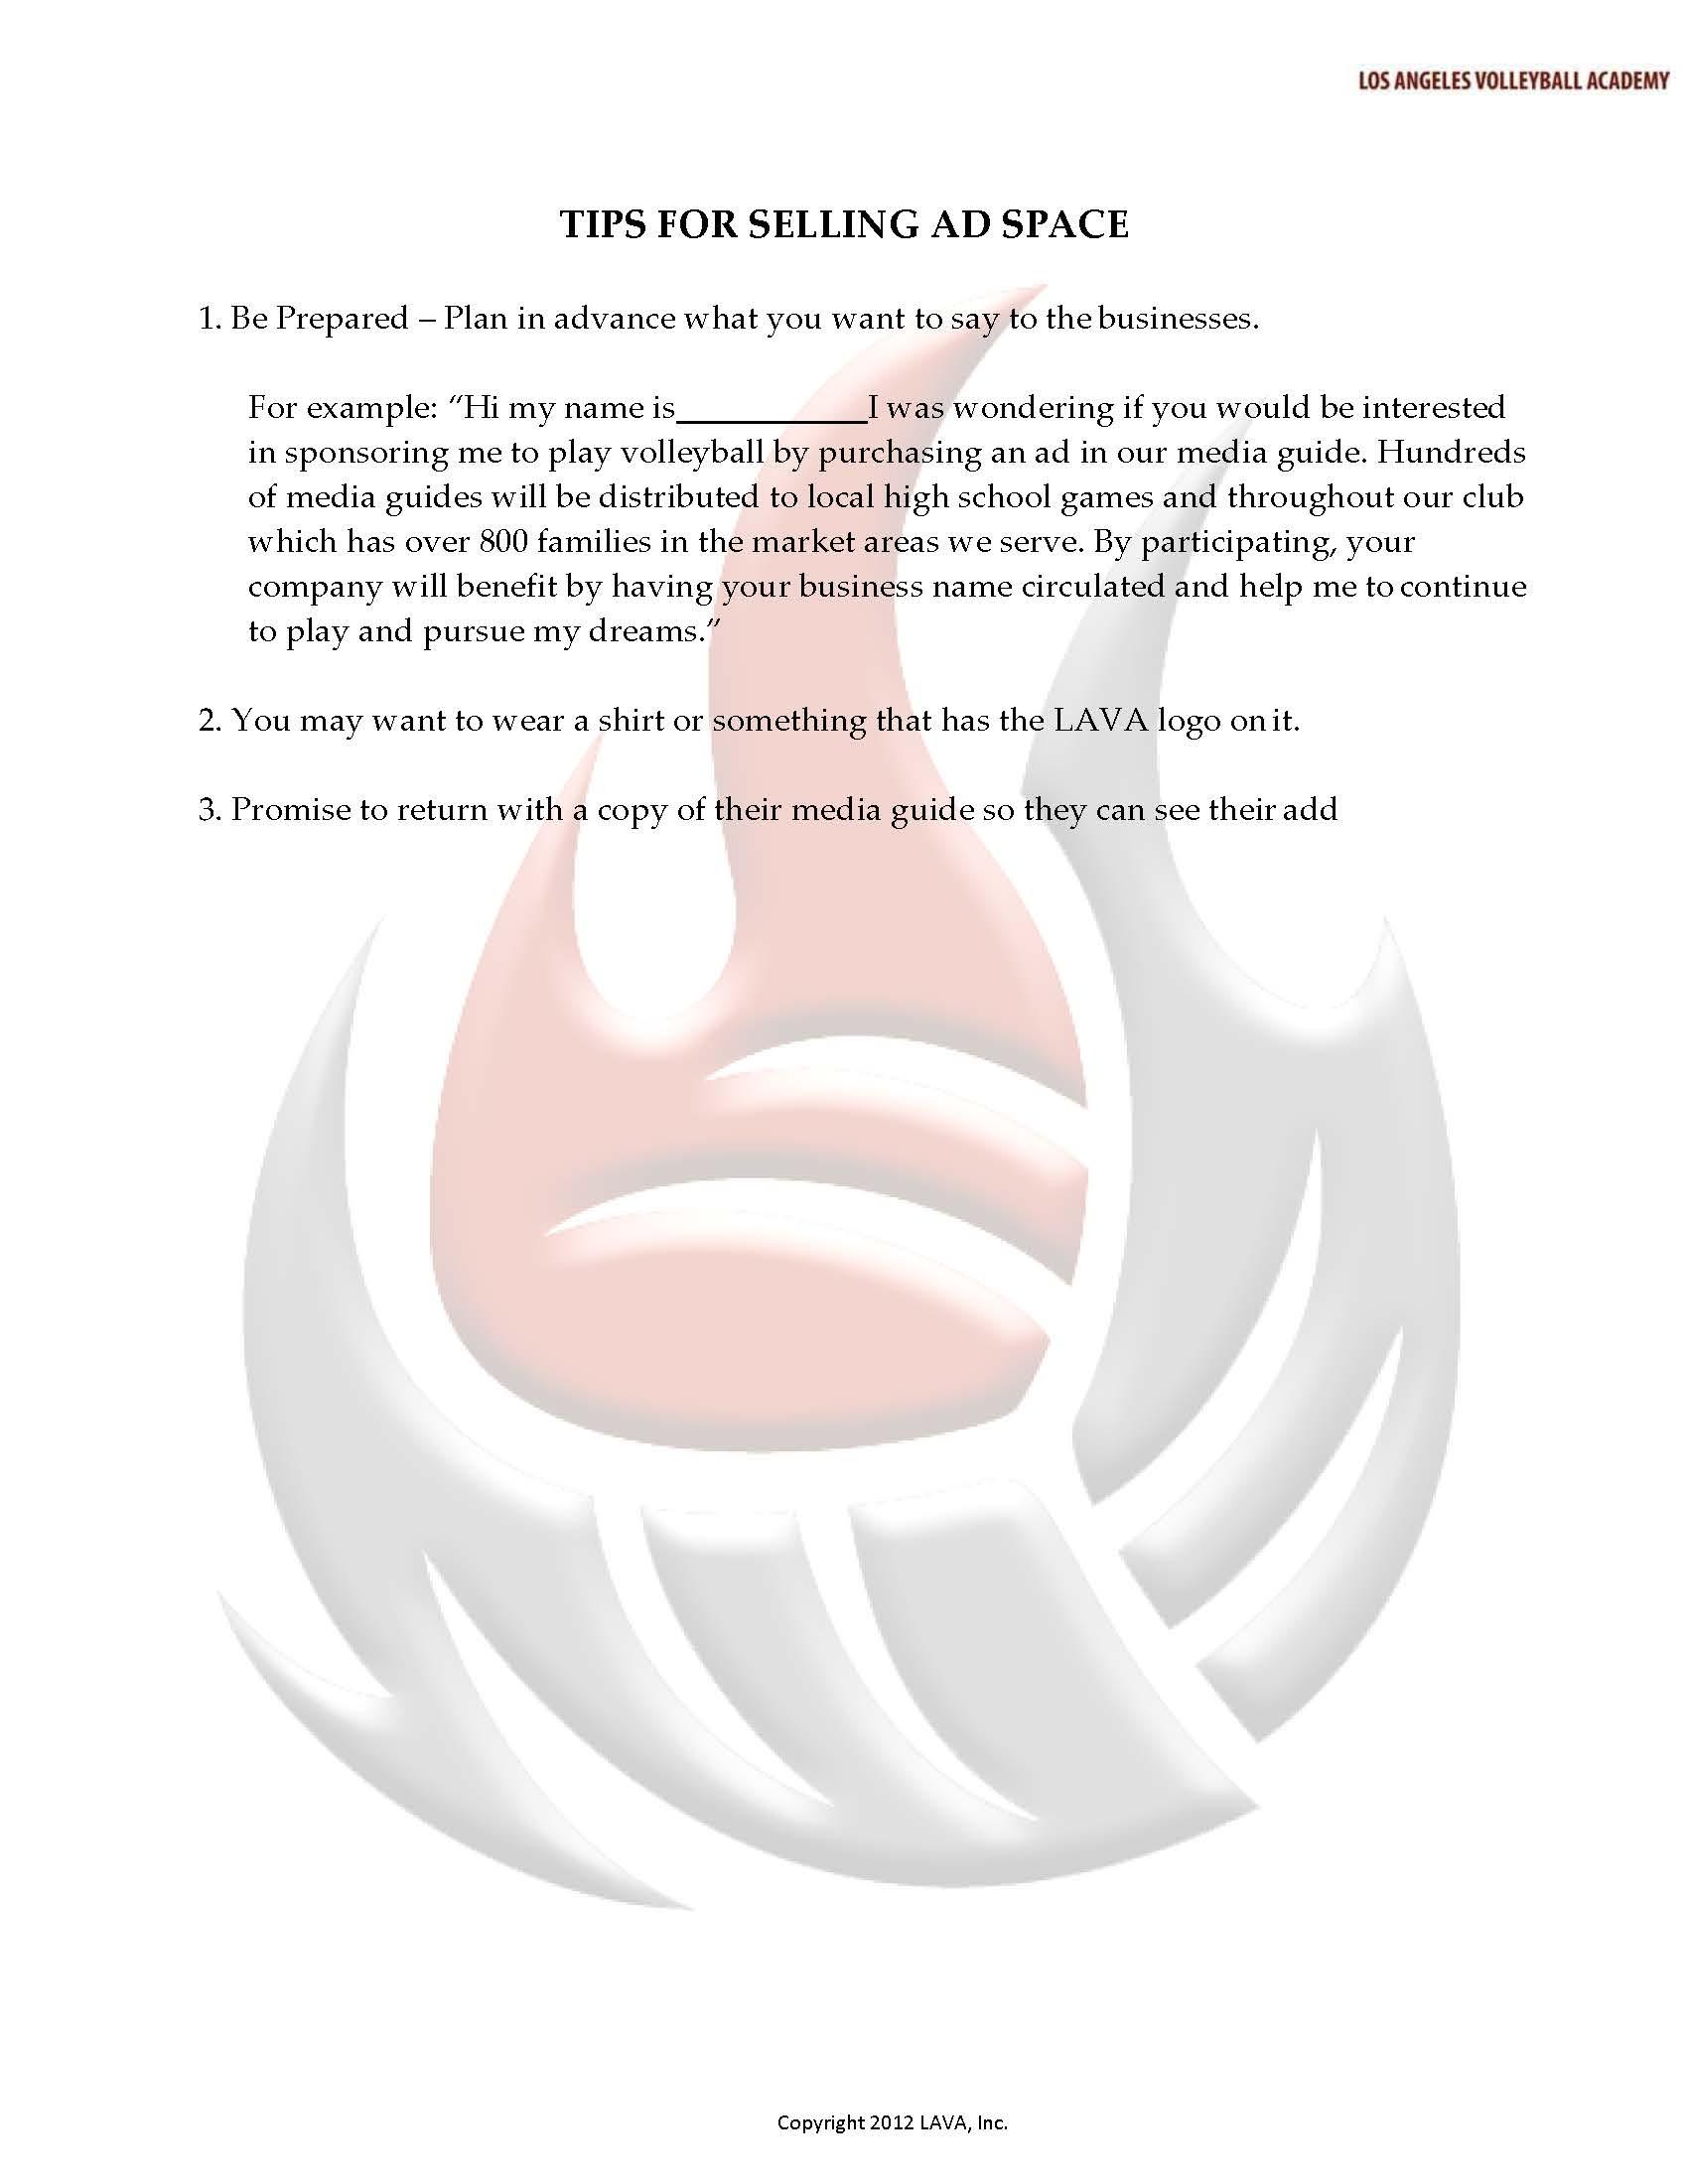 LAVA 2020.2021 Media Guide Form - Tips02